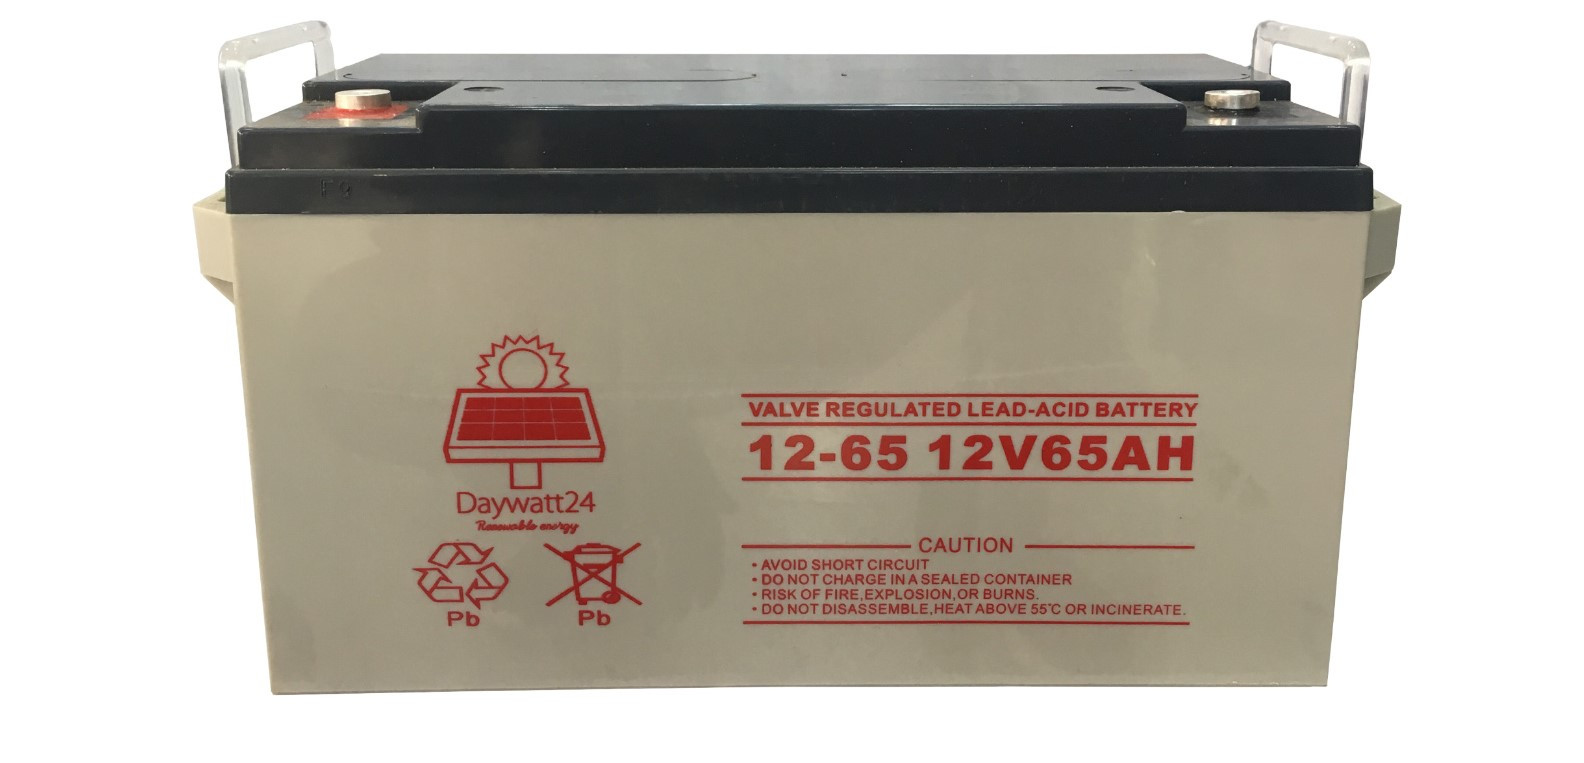 Baterias - Copy (2)2.jpg